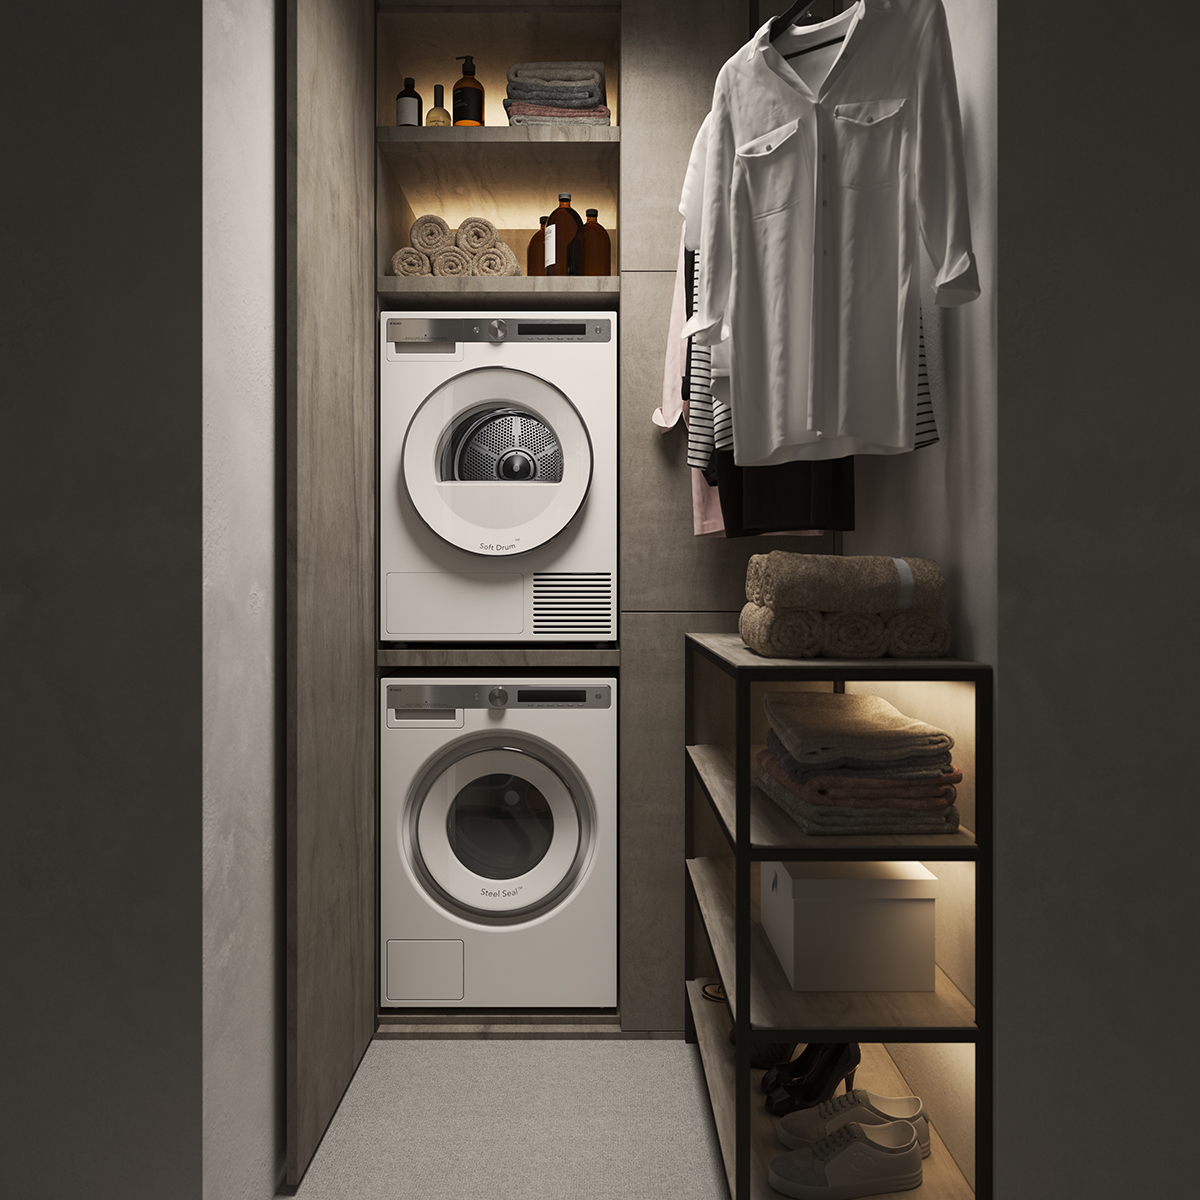 169787 file print asko amb laundry LaundryRoom smallFlat s Style w Final